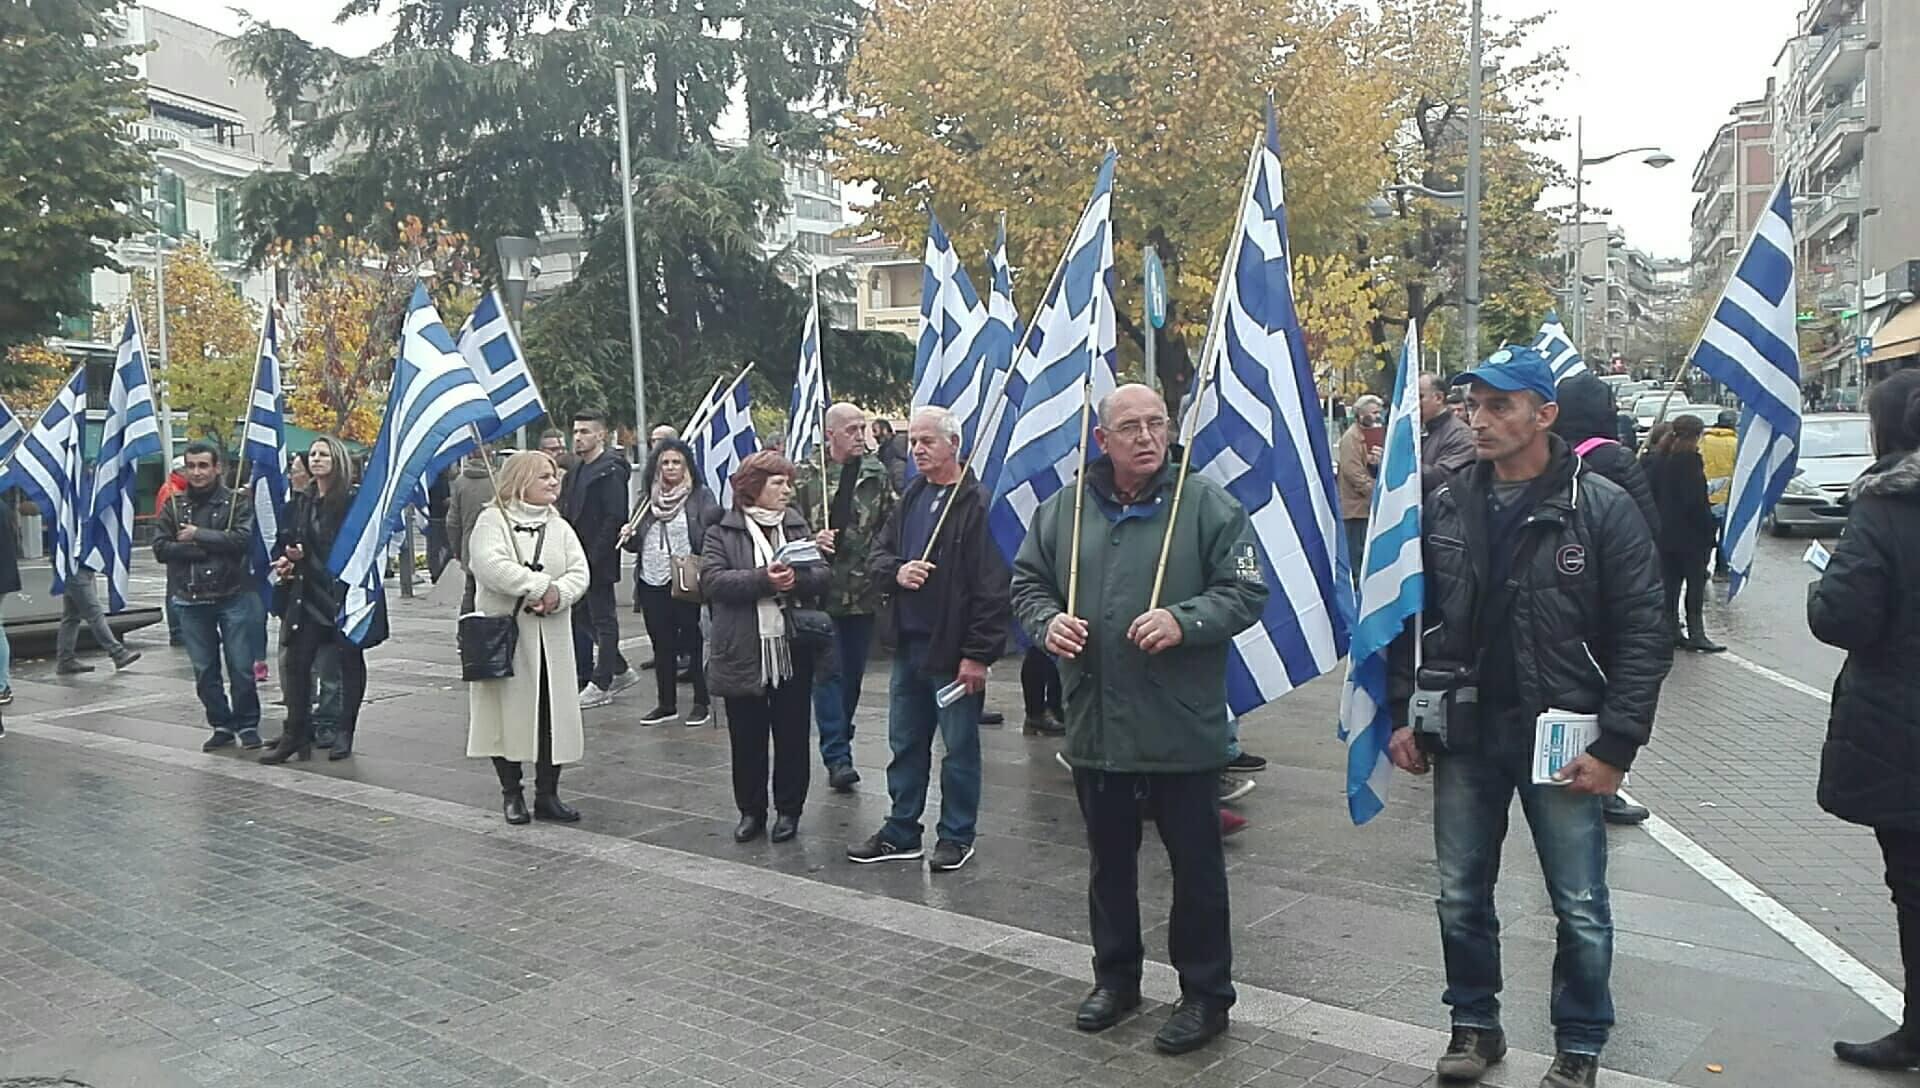 kozan.gr: Μέλη της Ελλήνων Συνέλευσις (Σώρρας), με ελληνικές σημαίες,  στην κεντρική πλατεία Κοζάνης (Φωτογραφίες-Bίντεο)